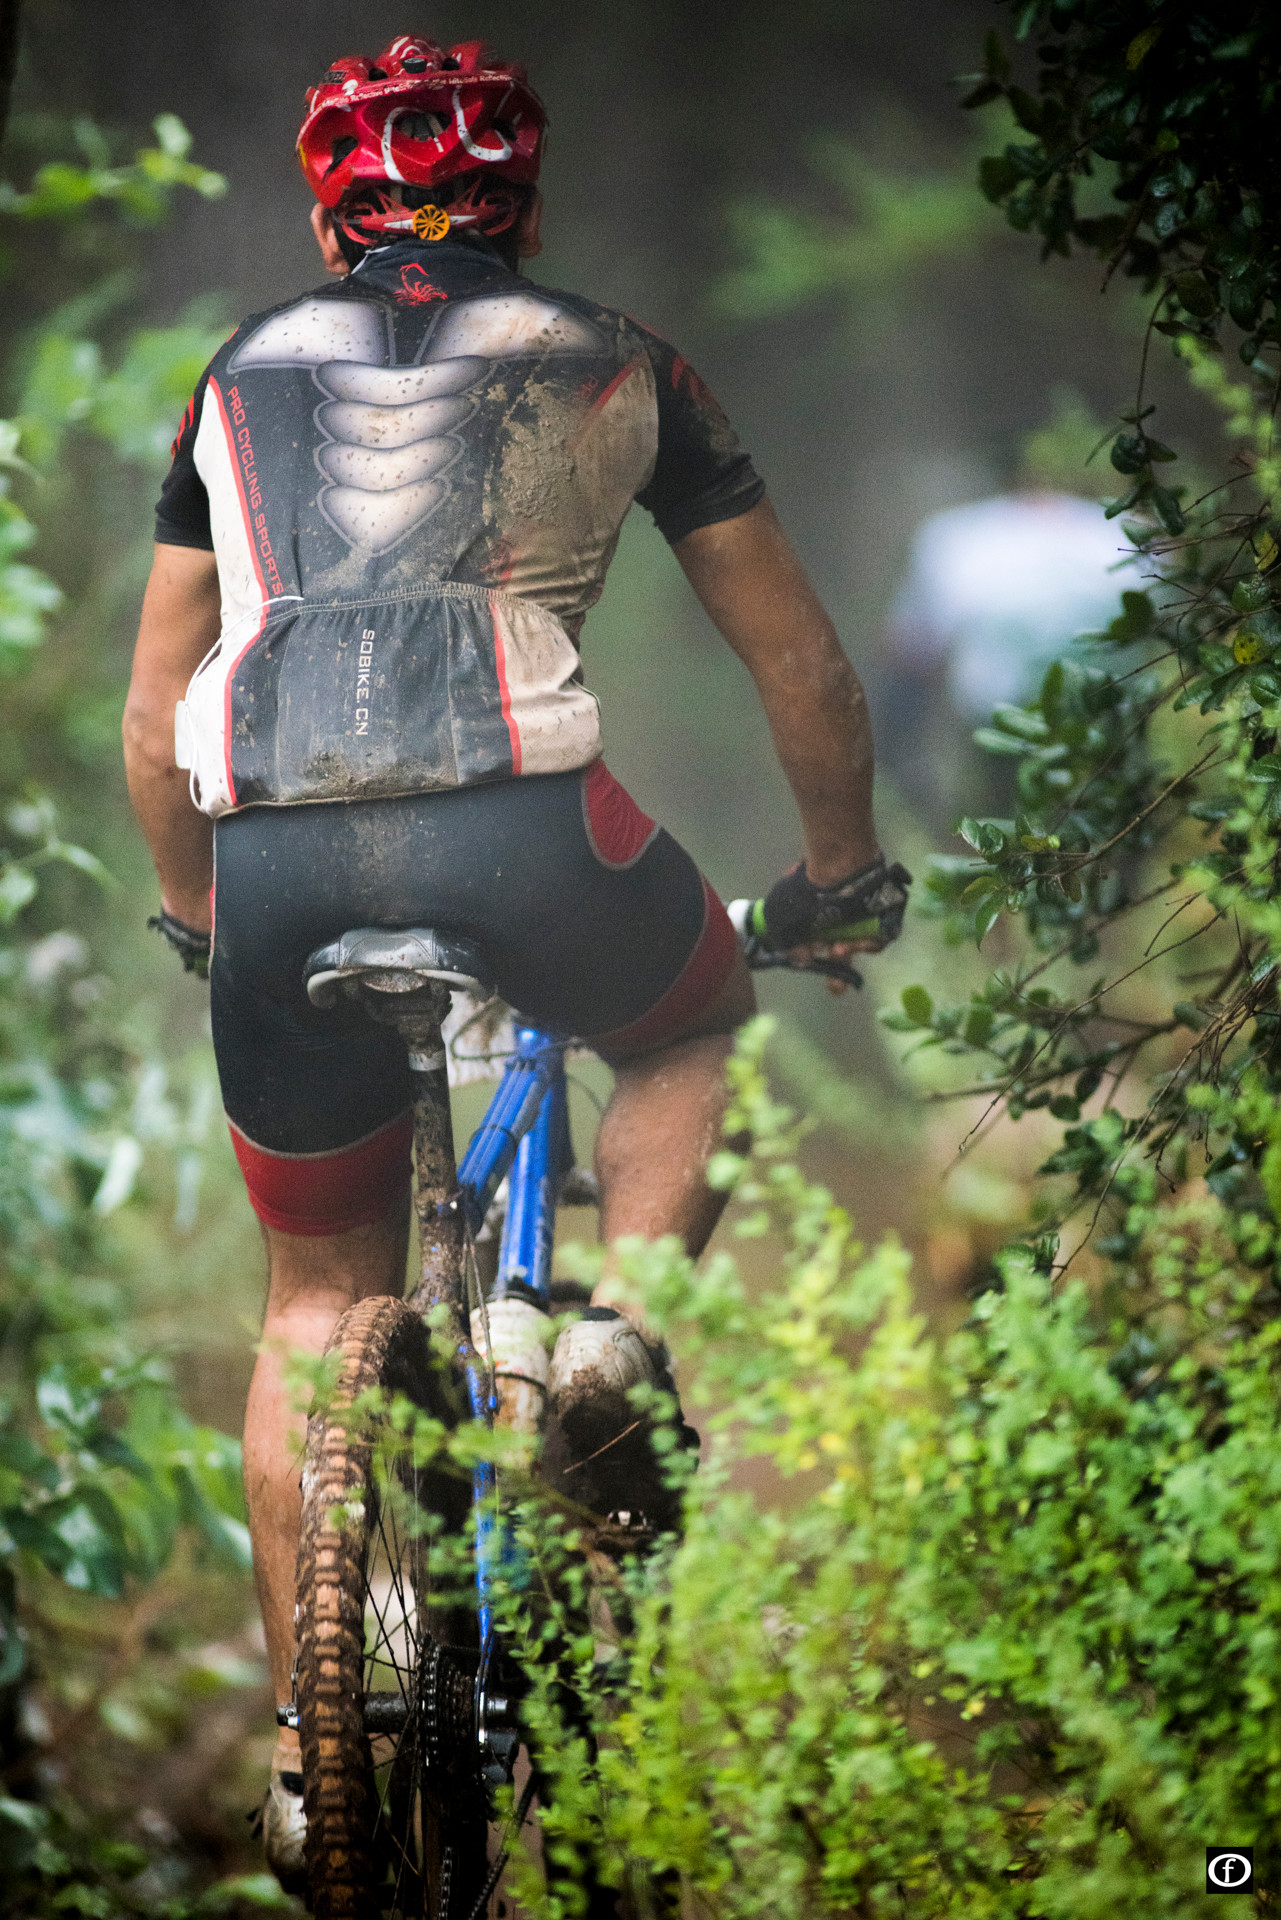 2015-05-17-Ciclismo Enduro-38.jpg